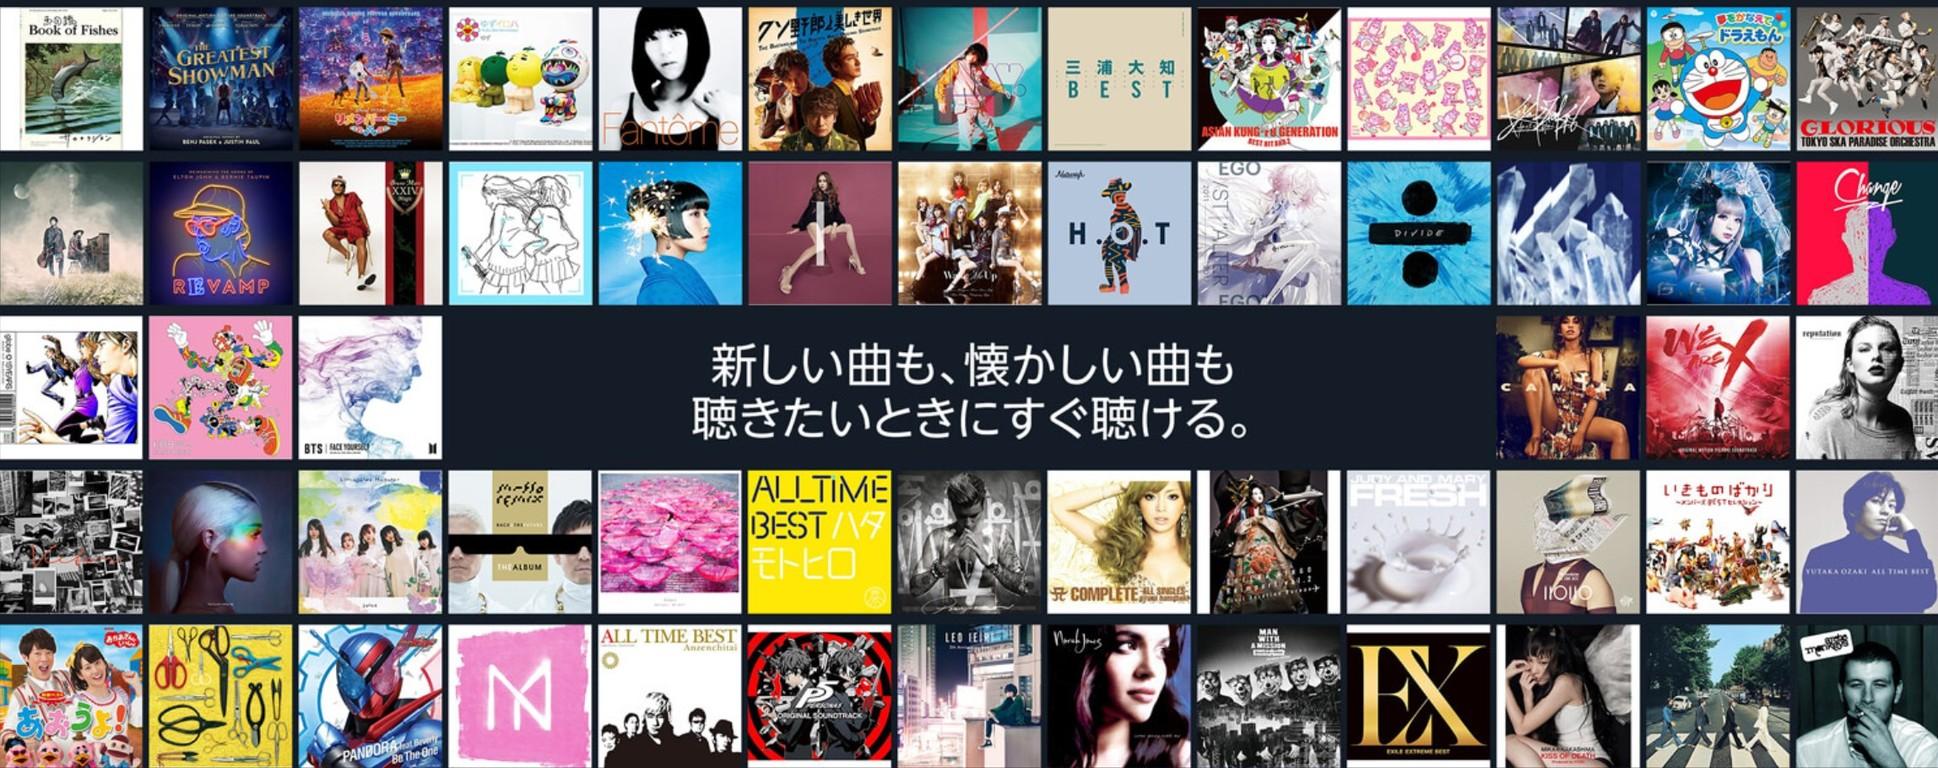 SnapCrab_NoName_2017-12-7_19-1-6_No-00